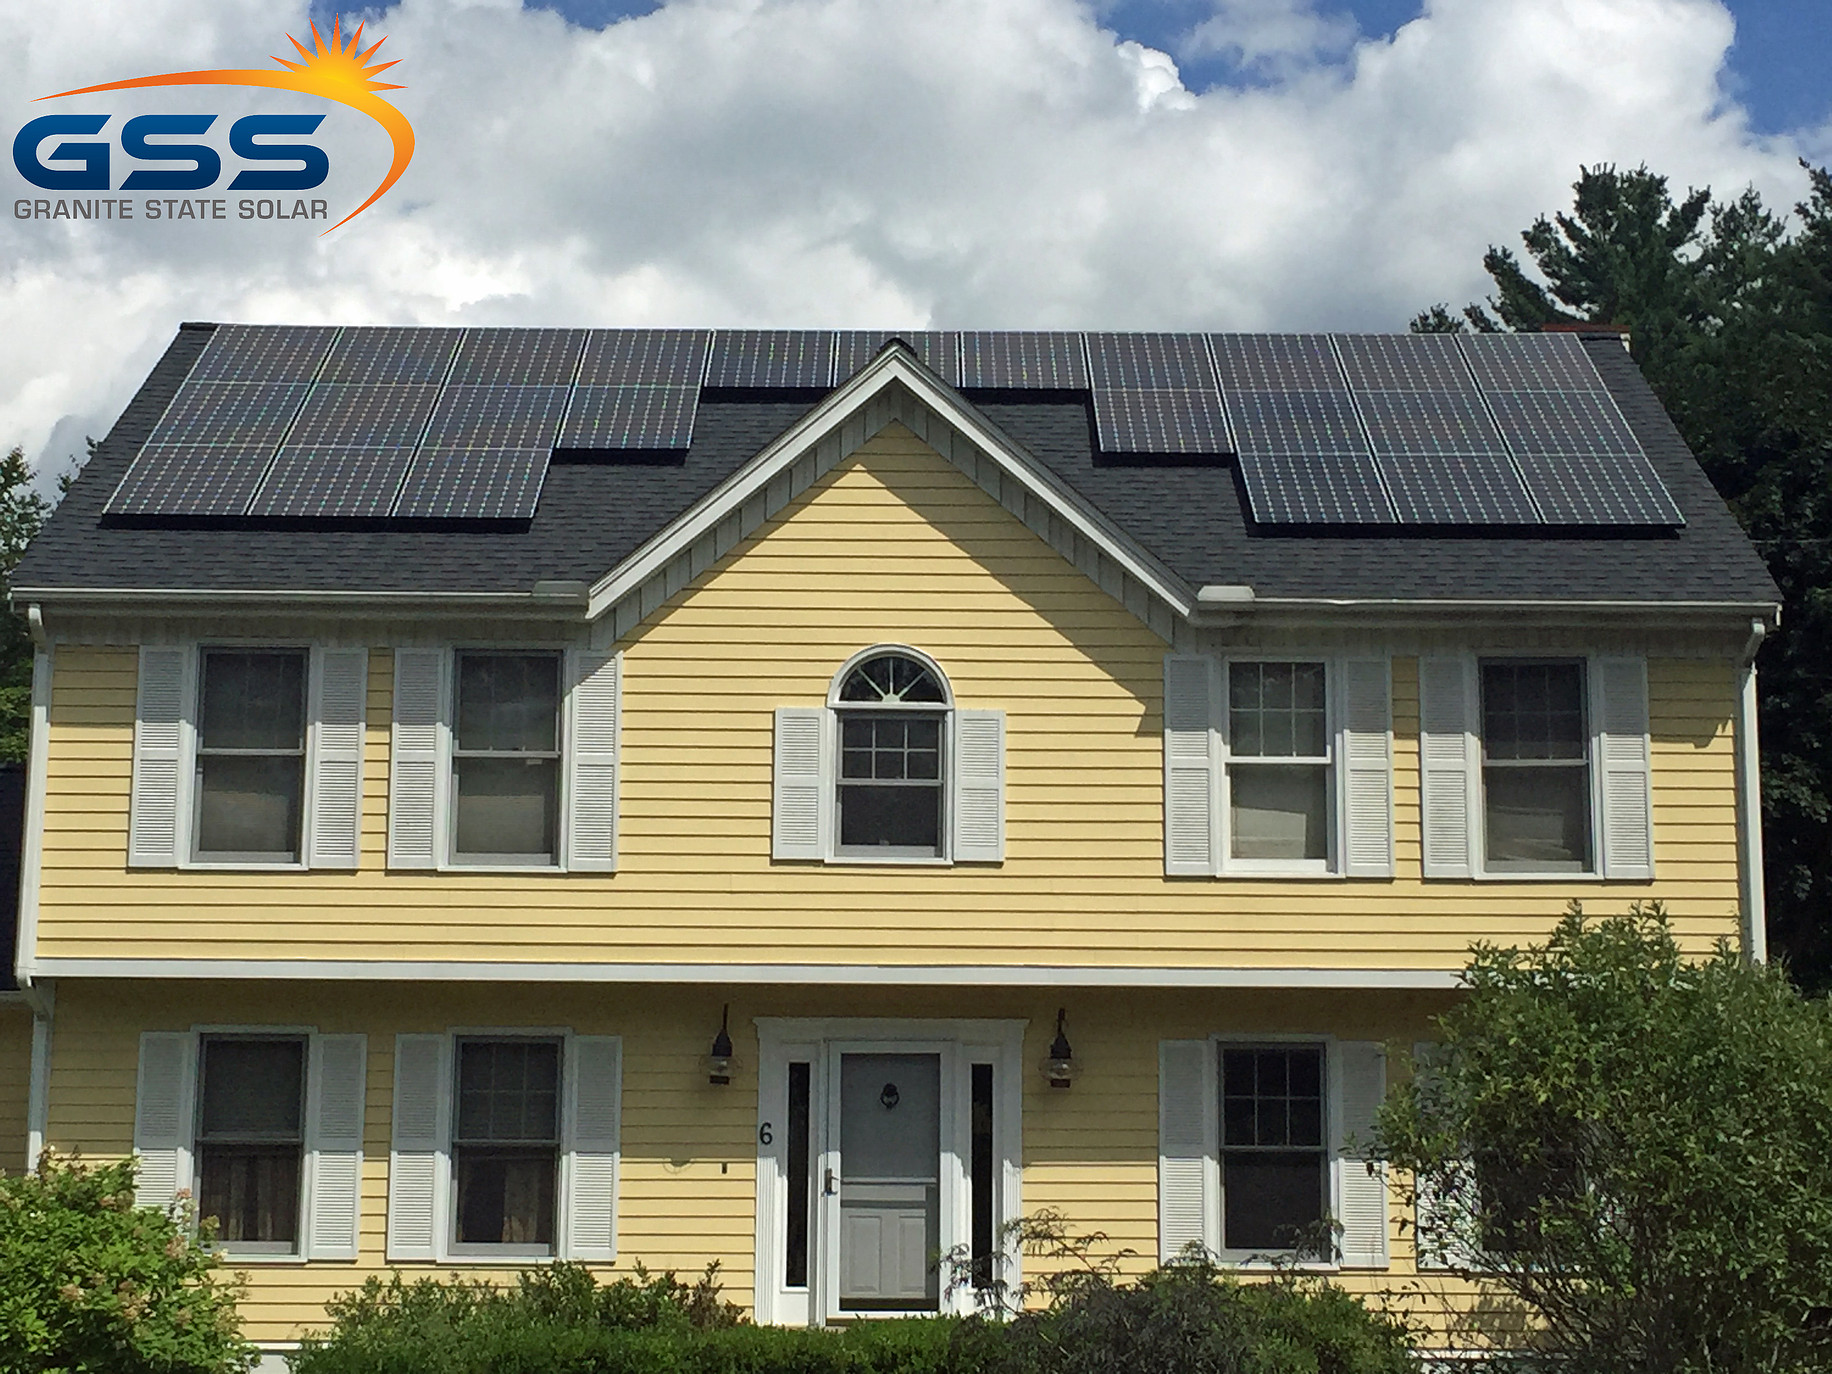 19 solar panel roof array